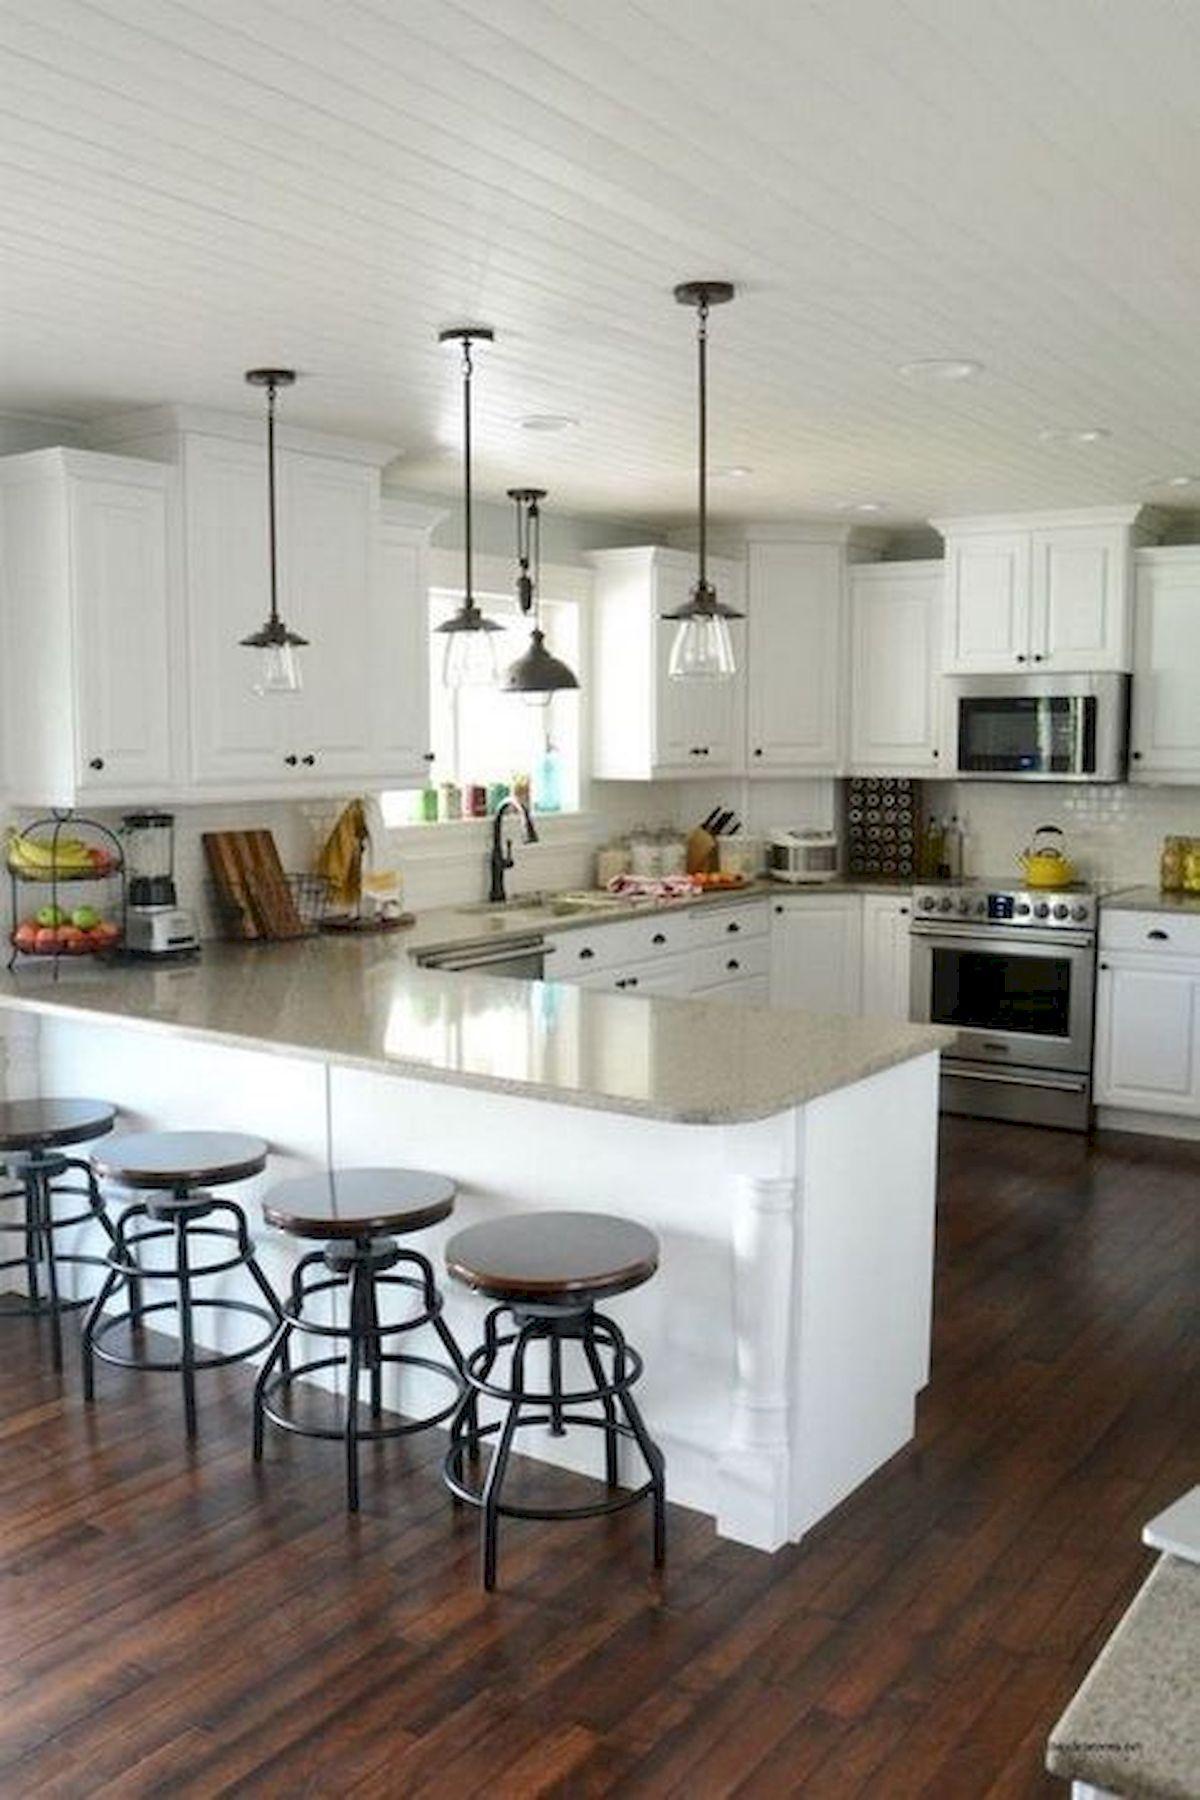 45 Easy Kitchen Decor and Design Ideas (36)